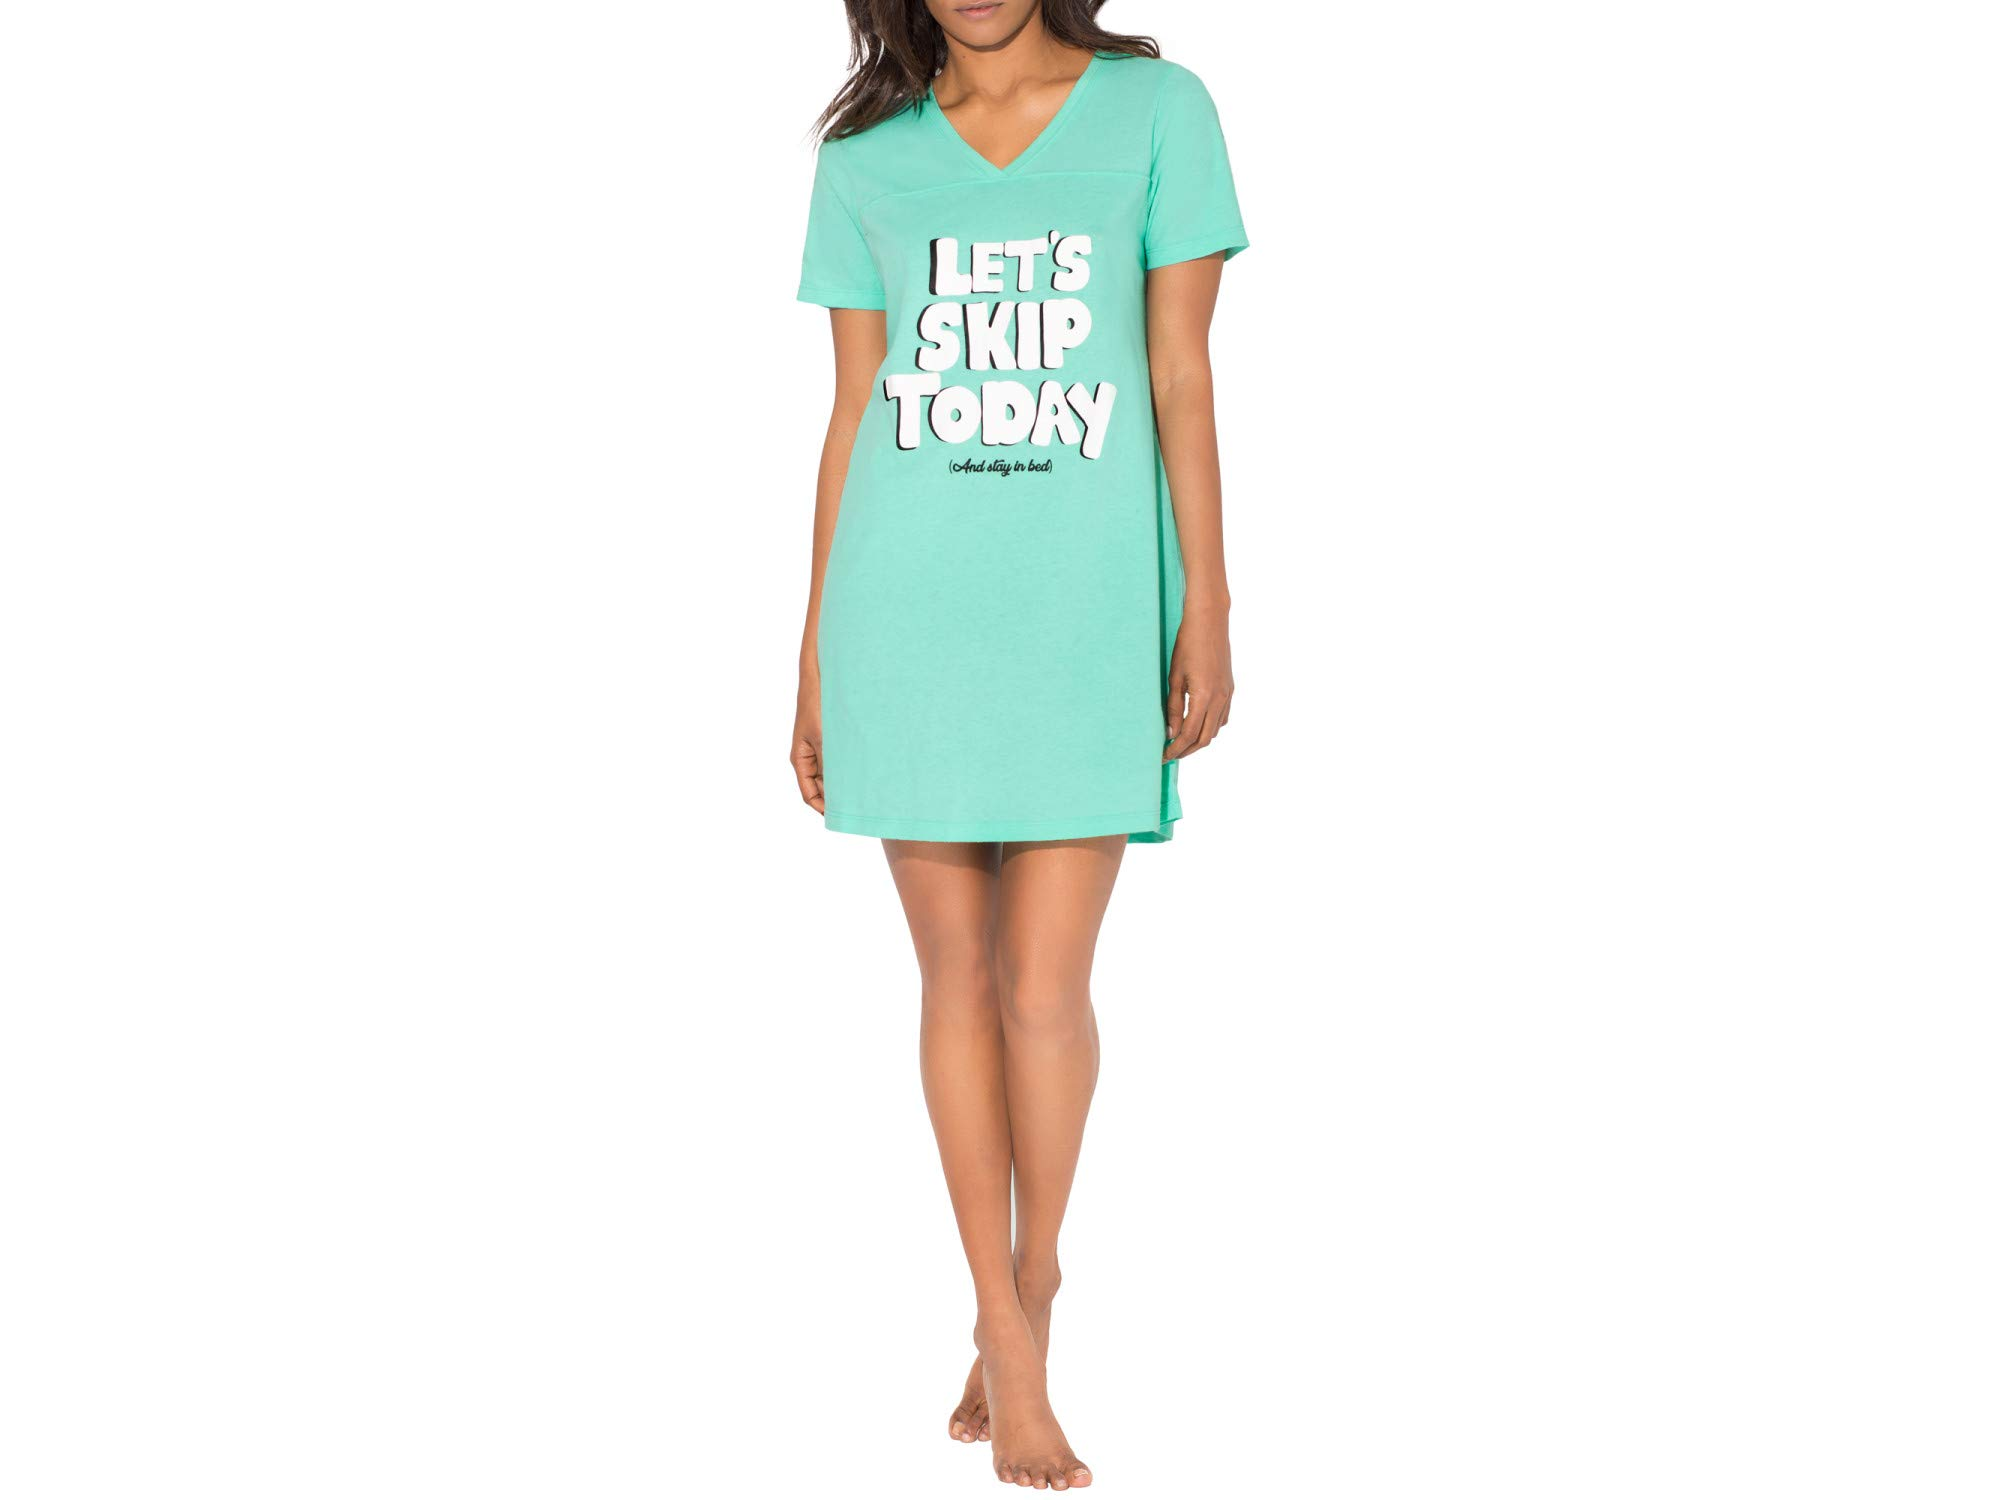 Smart & Sexy Women's V-Neck Oversized Sleep Shirt